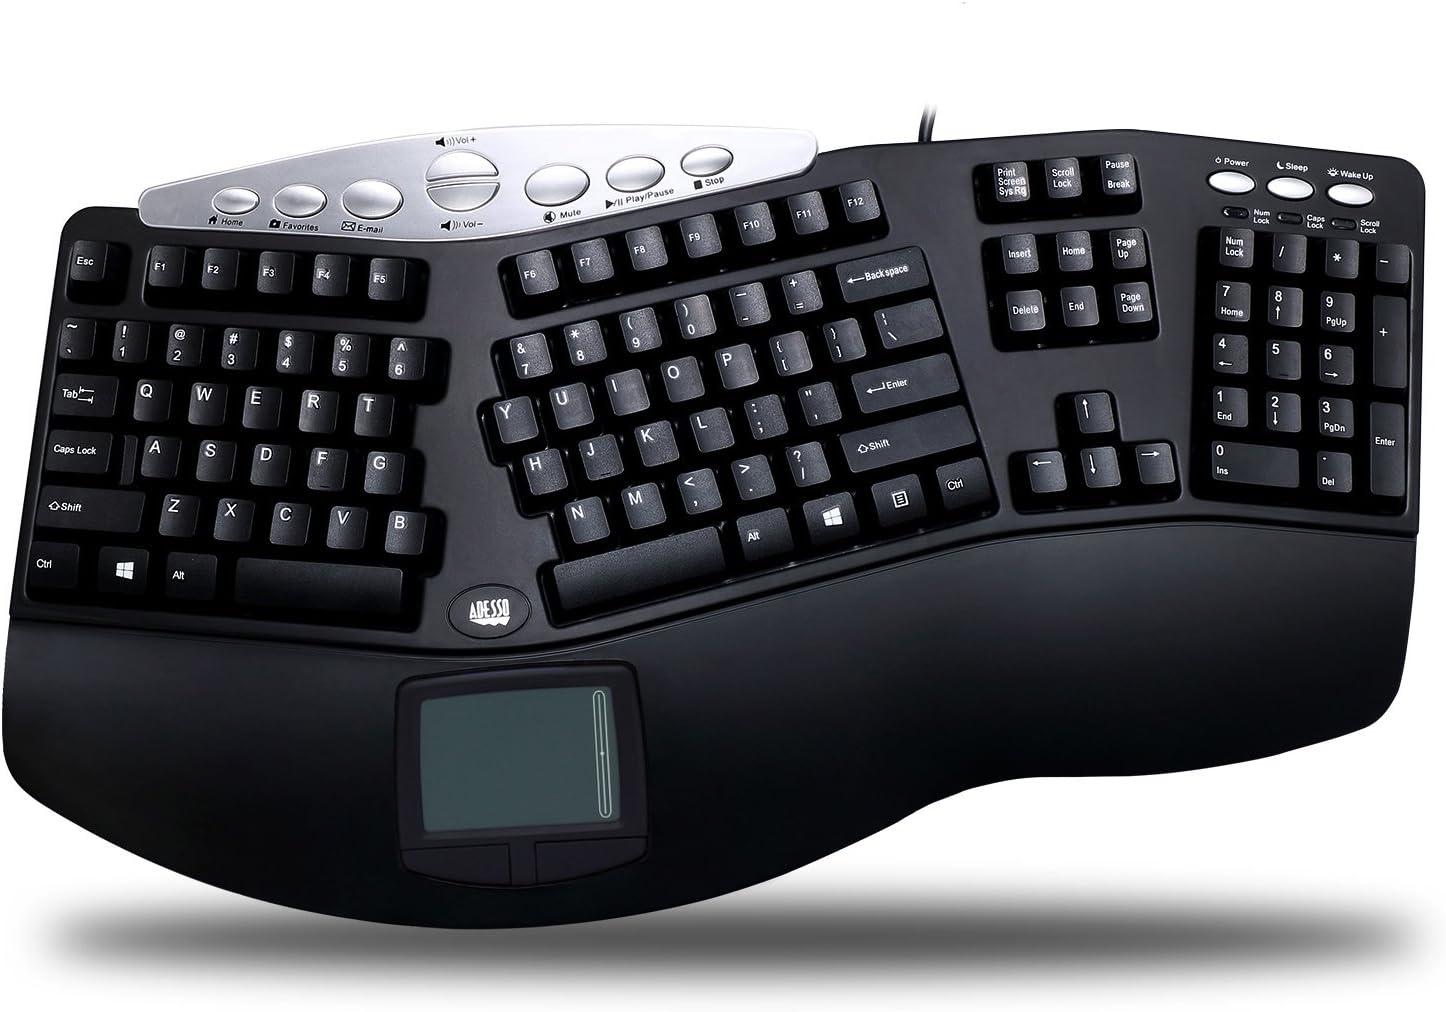 Adesso PCK-308UB - Tru-Form Pro Ergonomic Contour TouchPad USB Keyboard